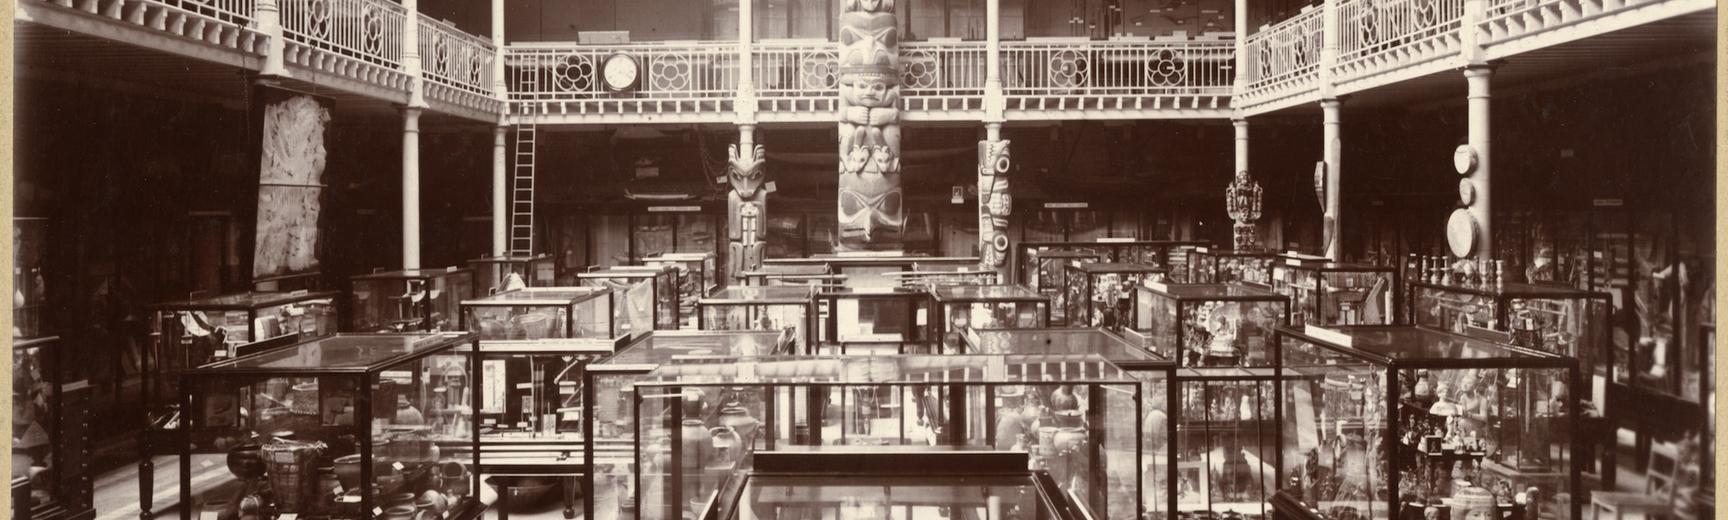 copyright pitt rivers museum university of oxford 1998 267 269 3